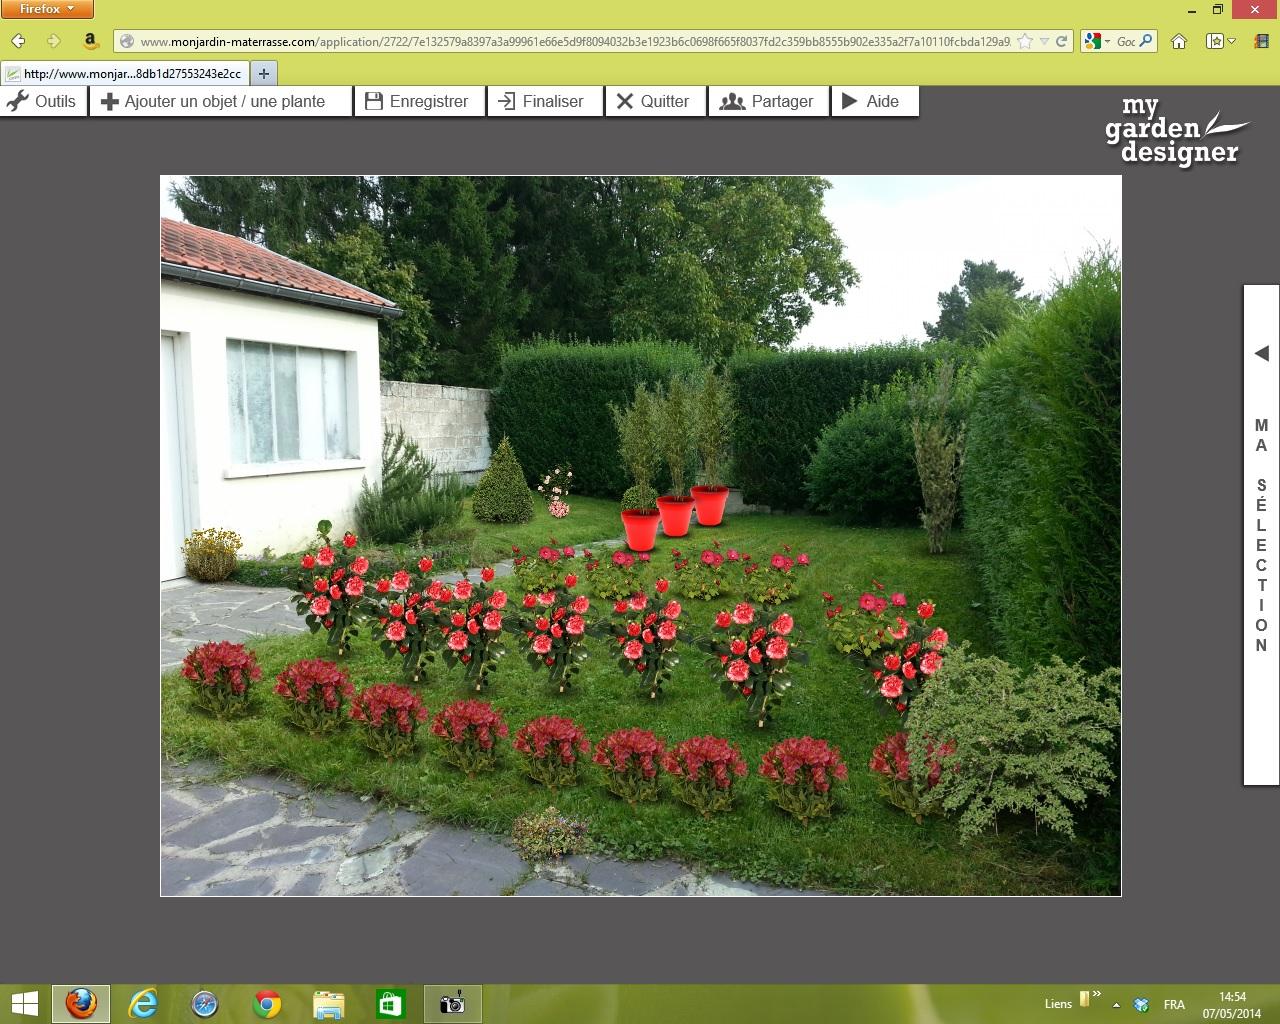 My garden designer un jeu d enfants monjardin for Monjardin materrasse